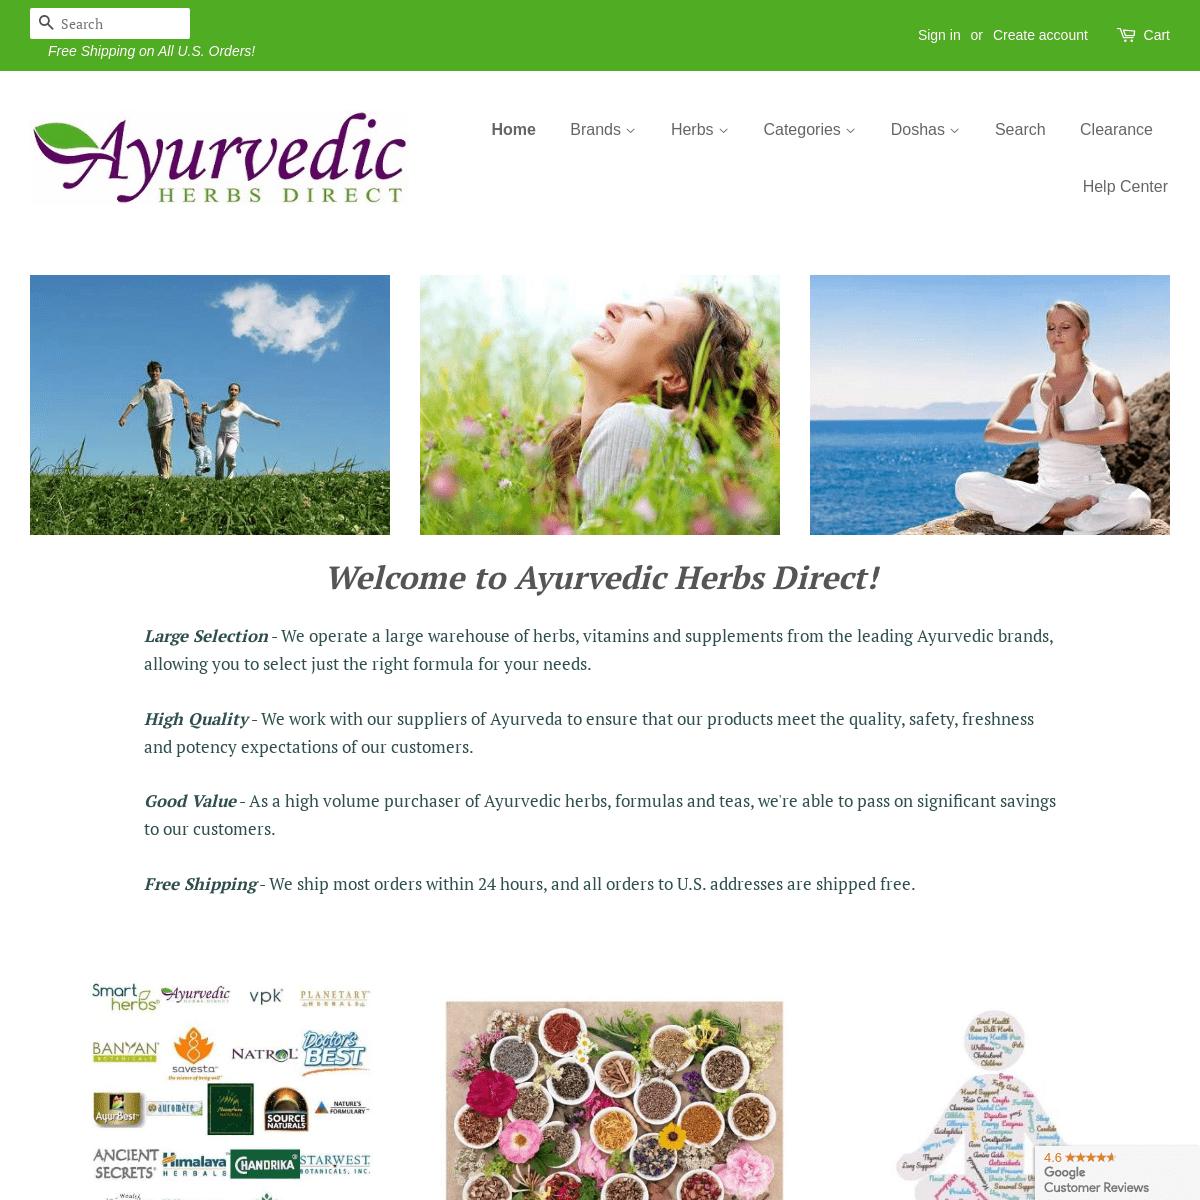 Ayurvedic Herbs Direct